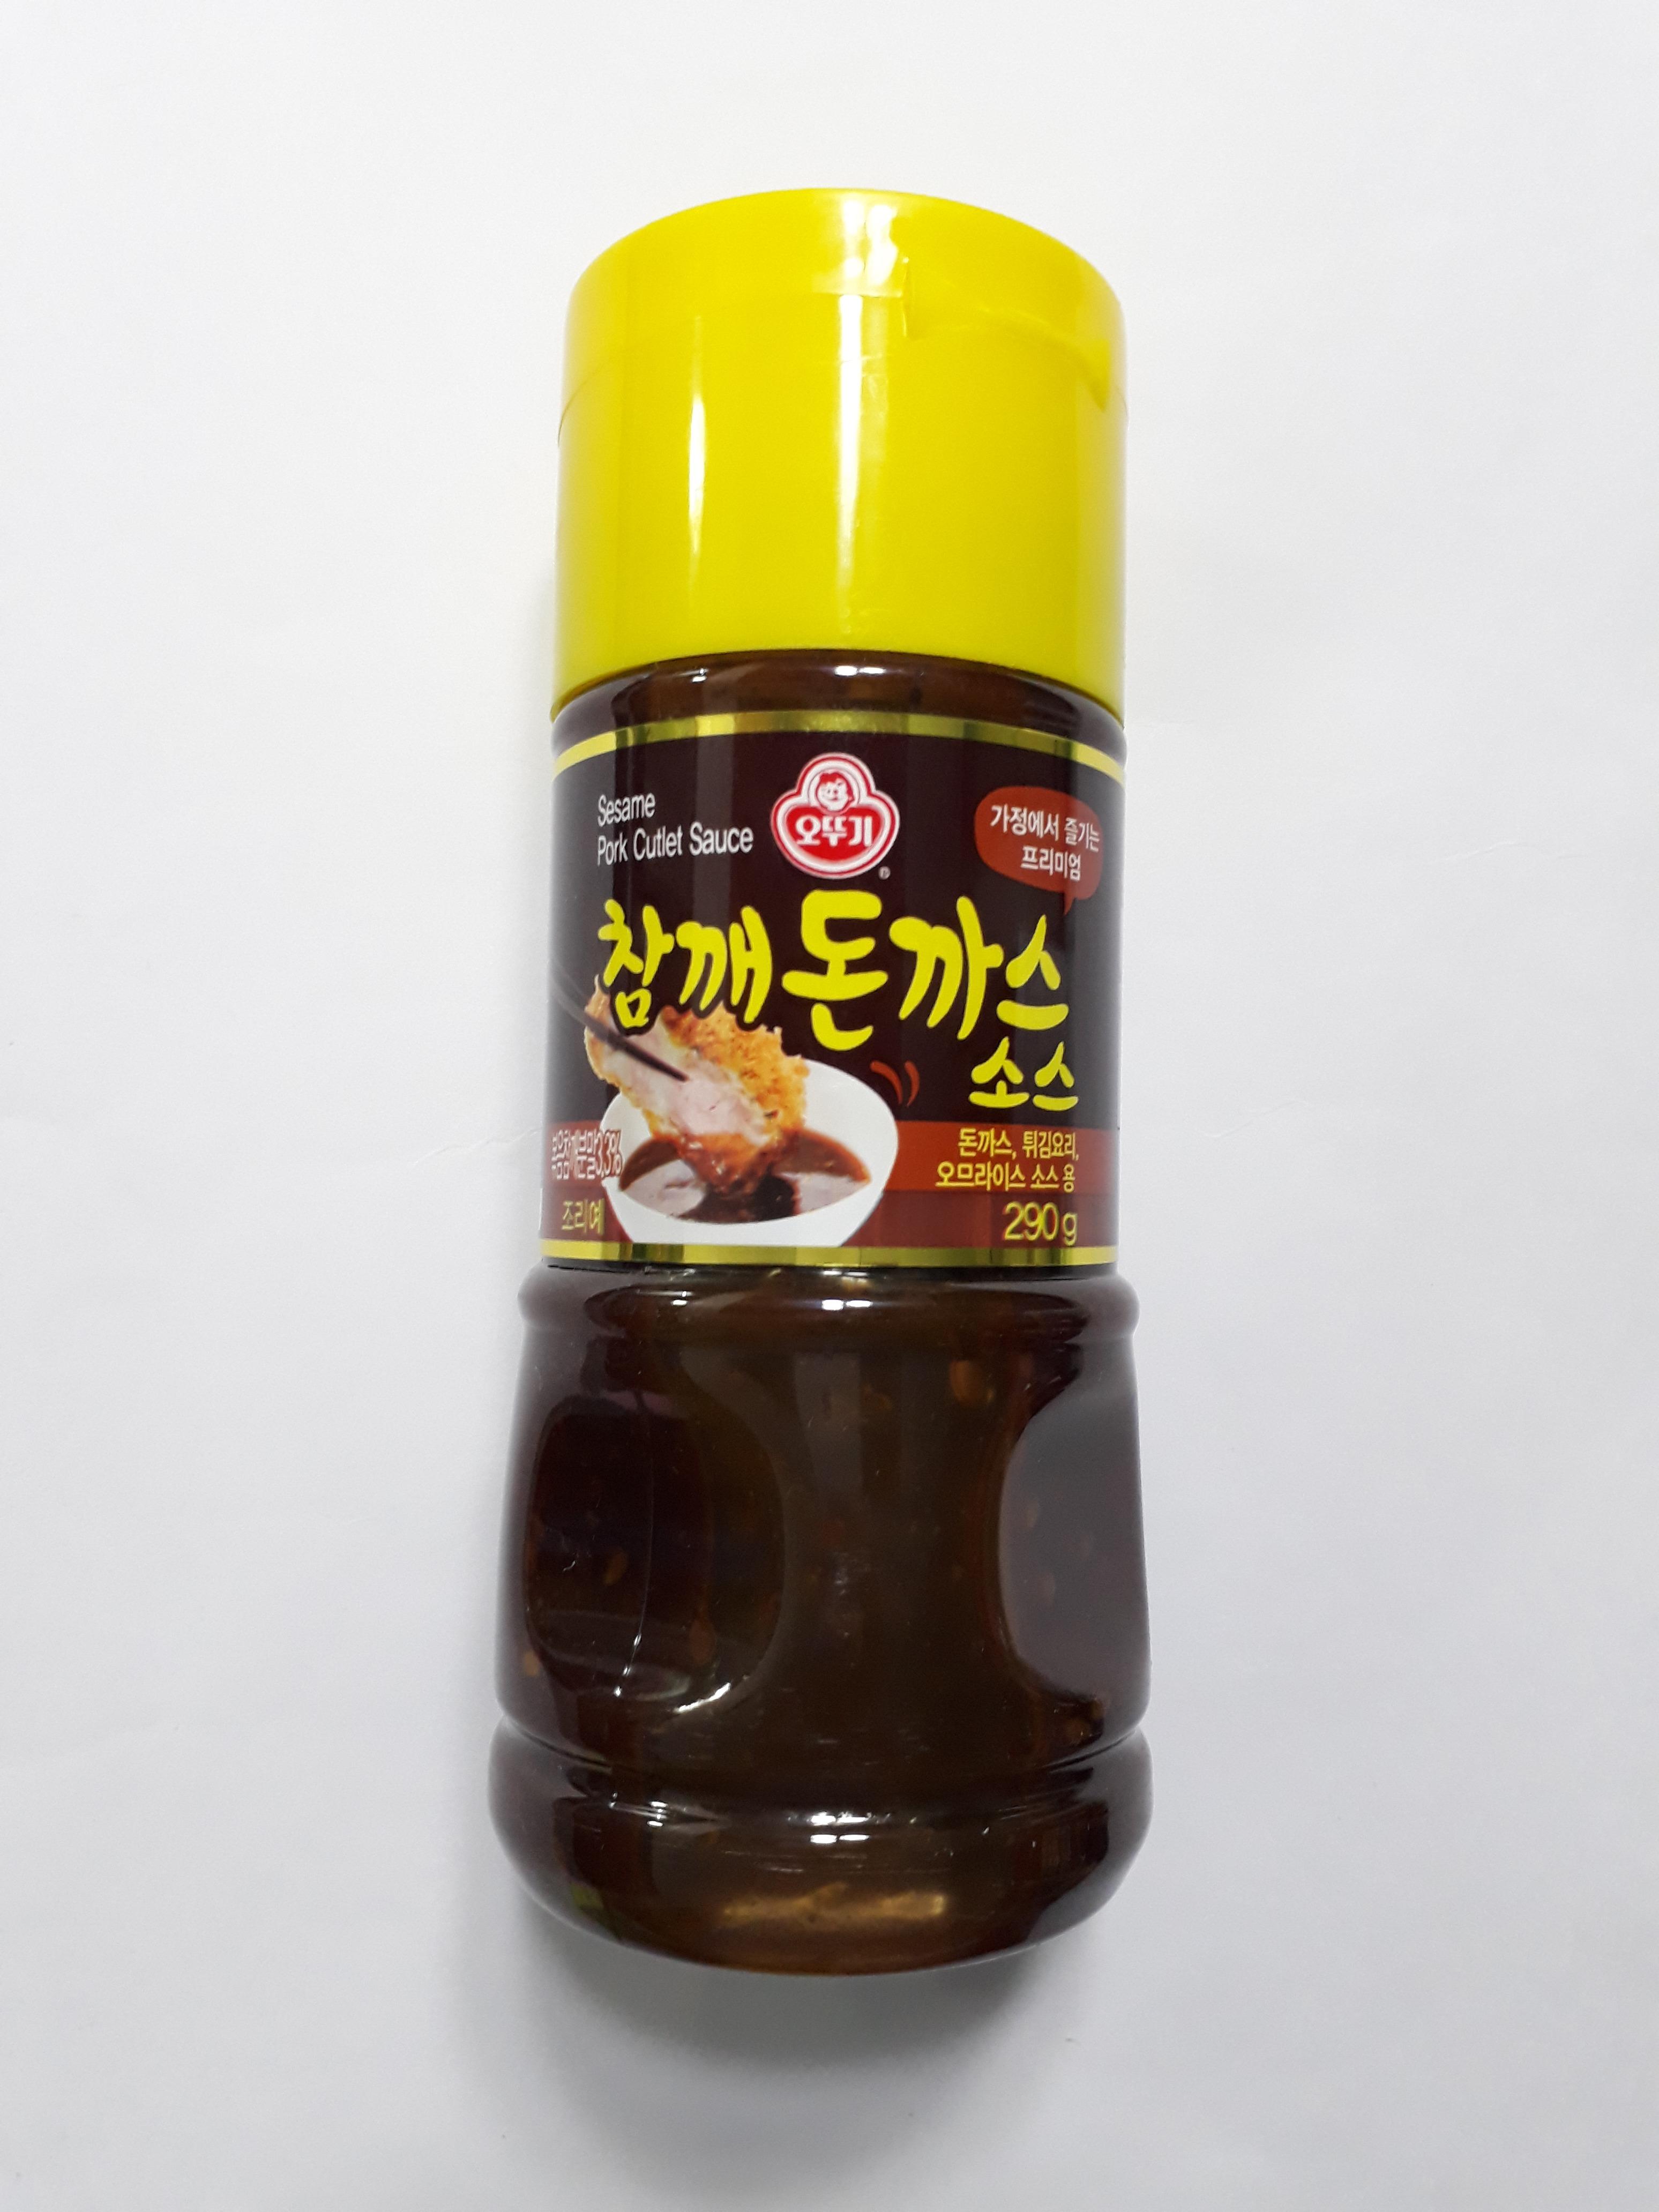 Sesame Pork Cutlet Sauce Japanese Tonkatsu Sauce Dip 290g Lazada Ph